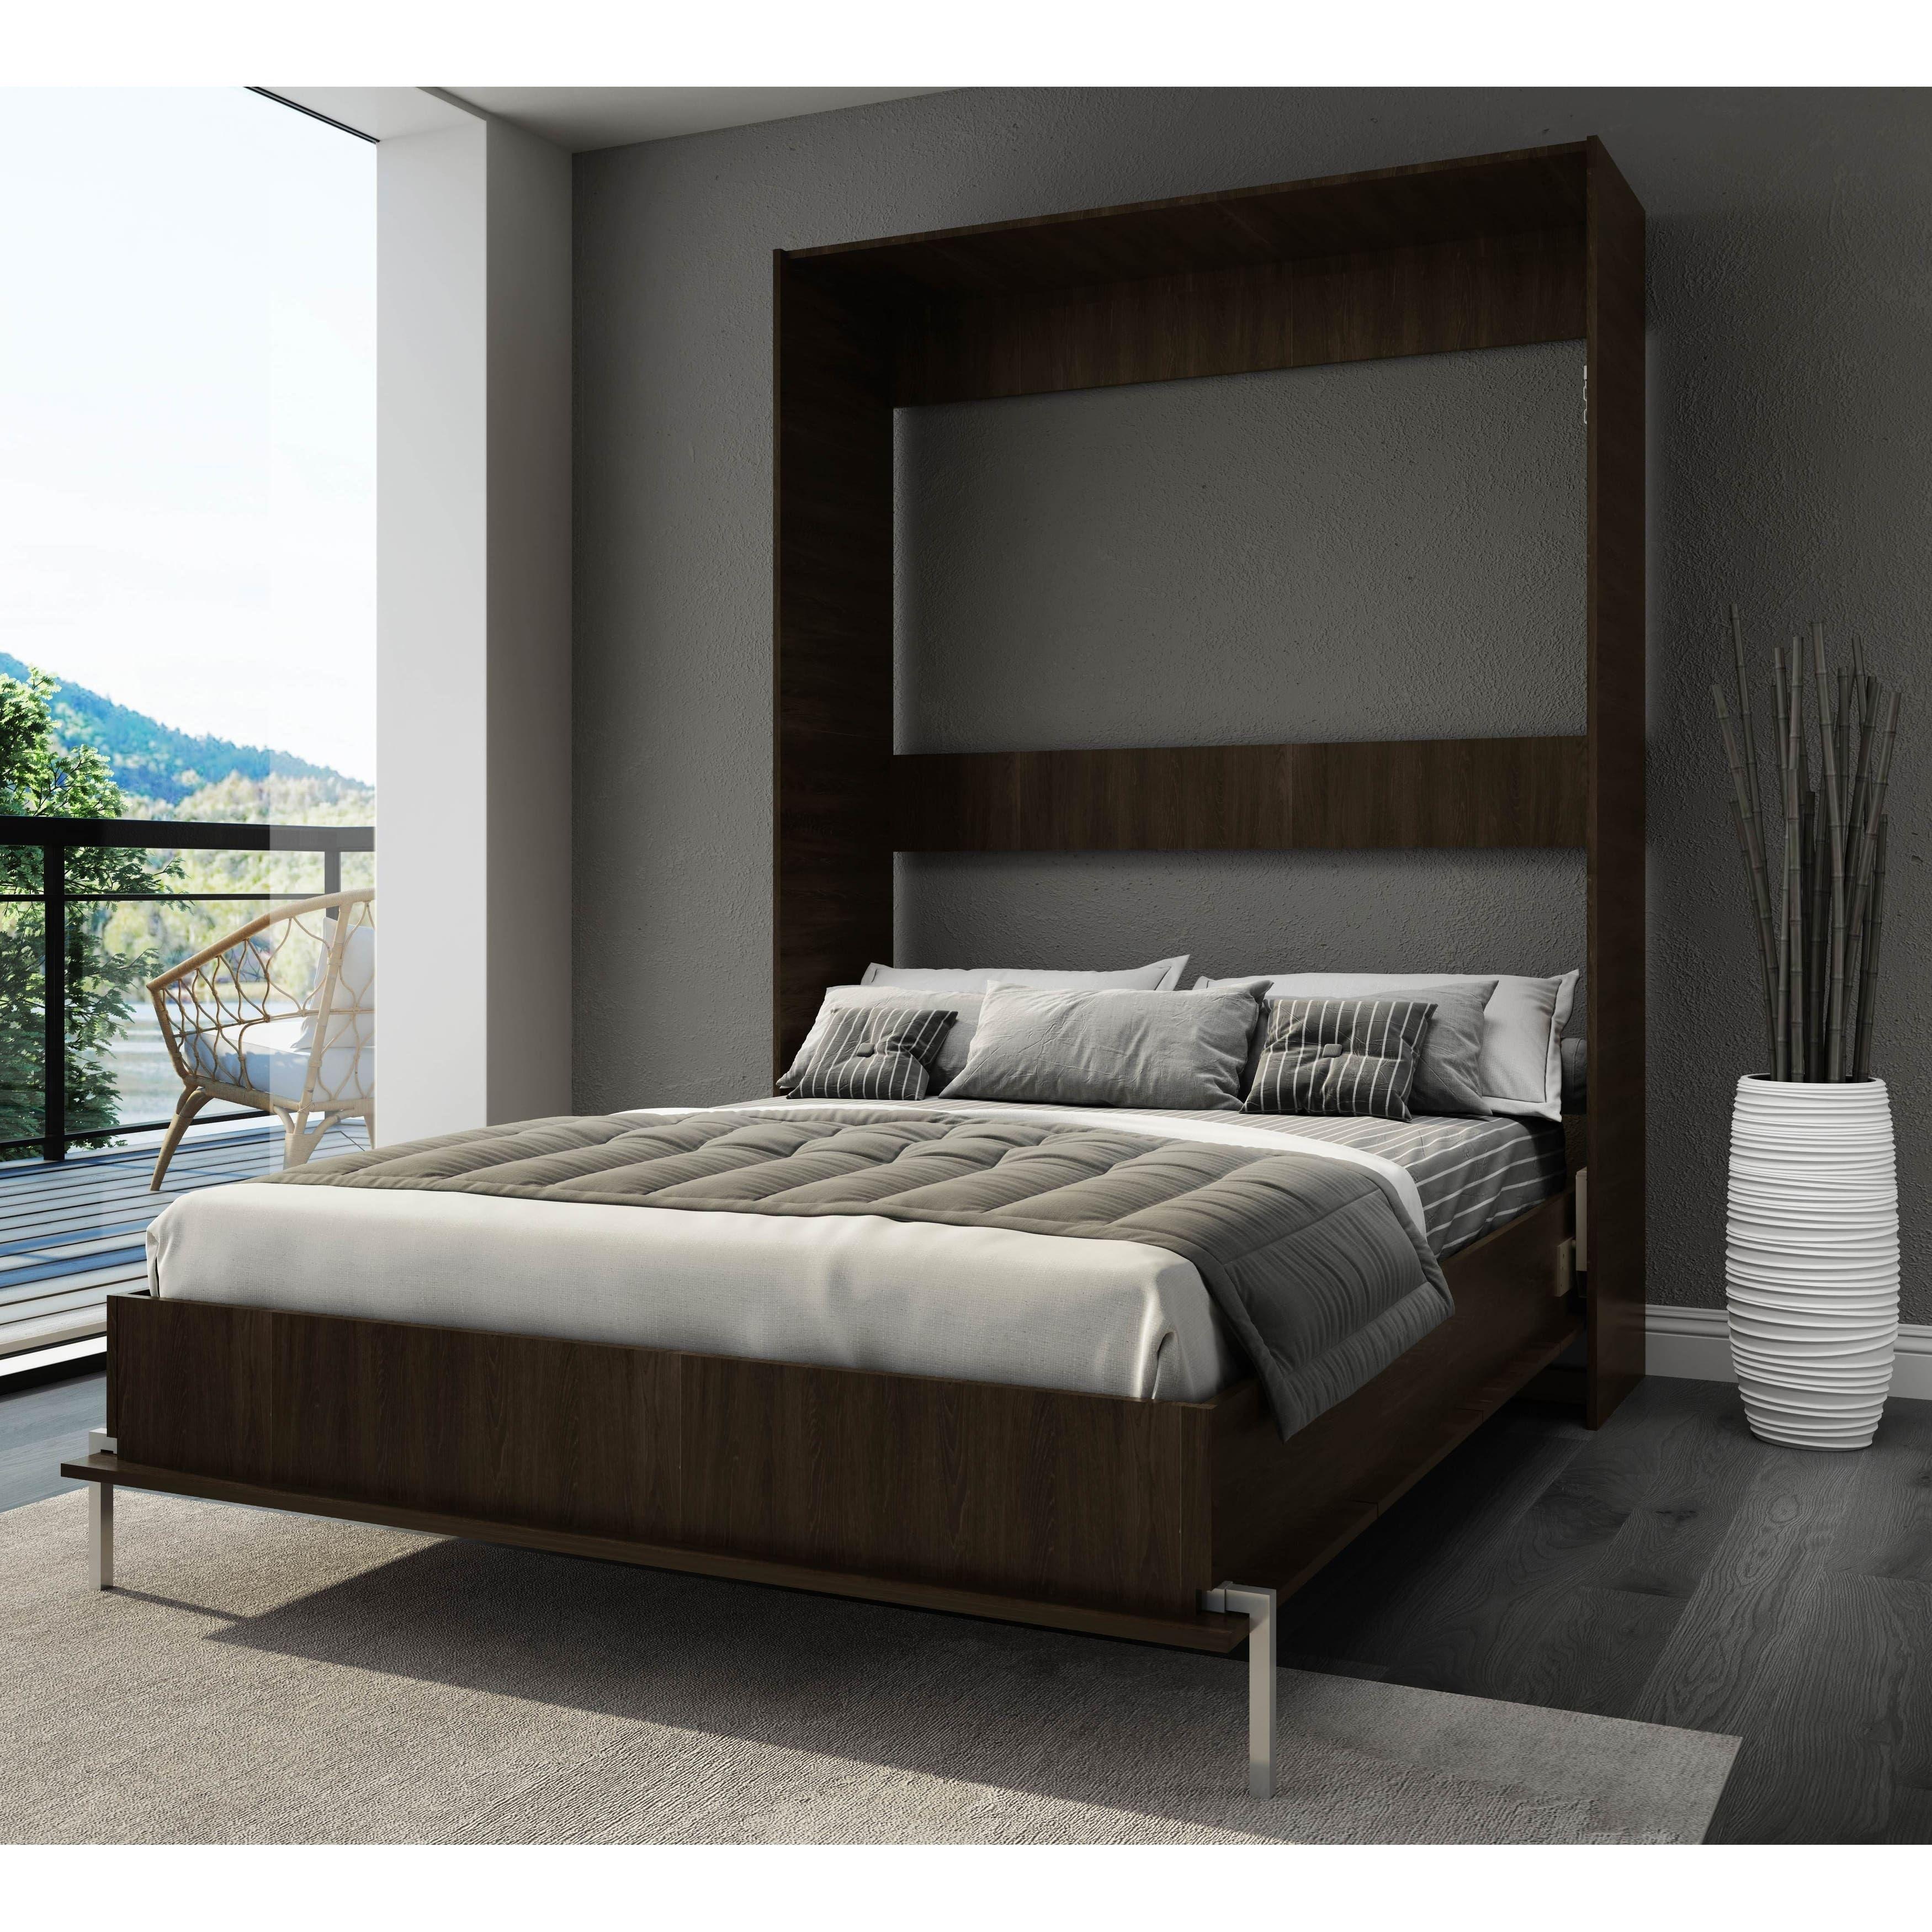 Stellar Home Furniture Urban Full Wall Bed Full murphy